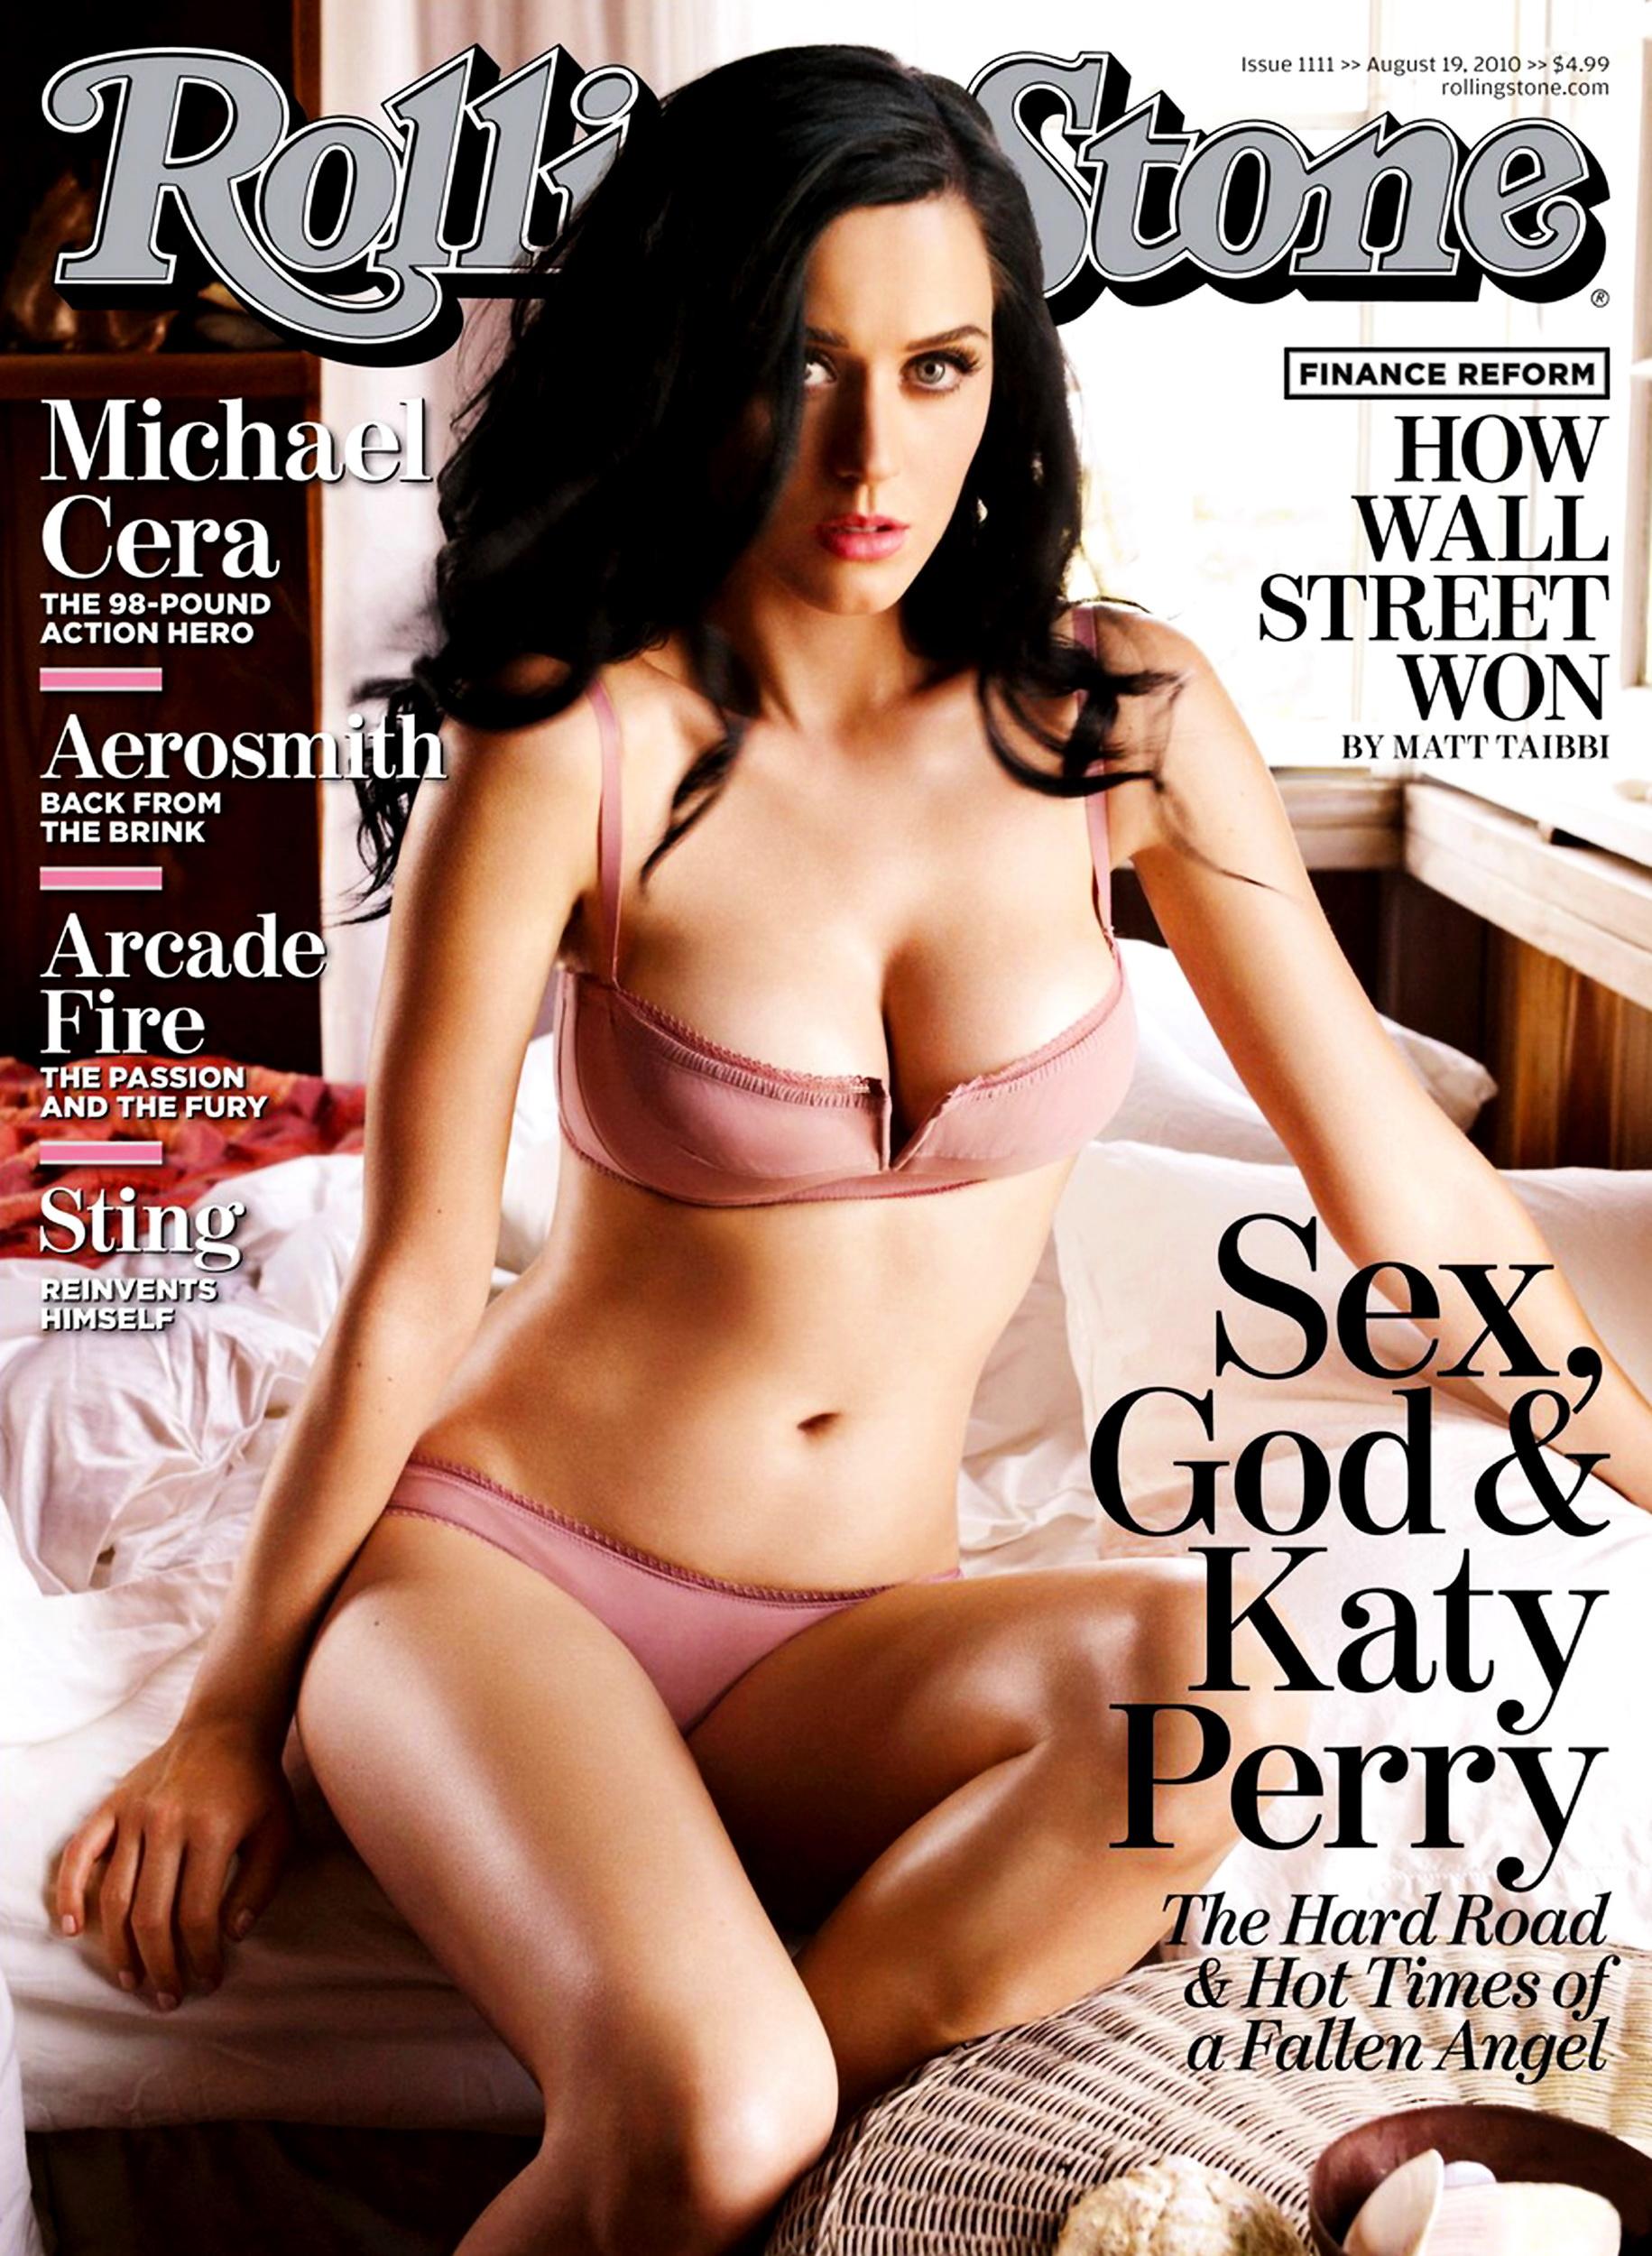 76424_Katy_Perry_Rolling_Stone_4_122_521lo.jpg